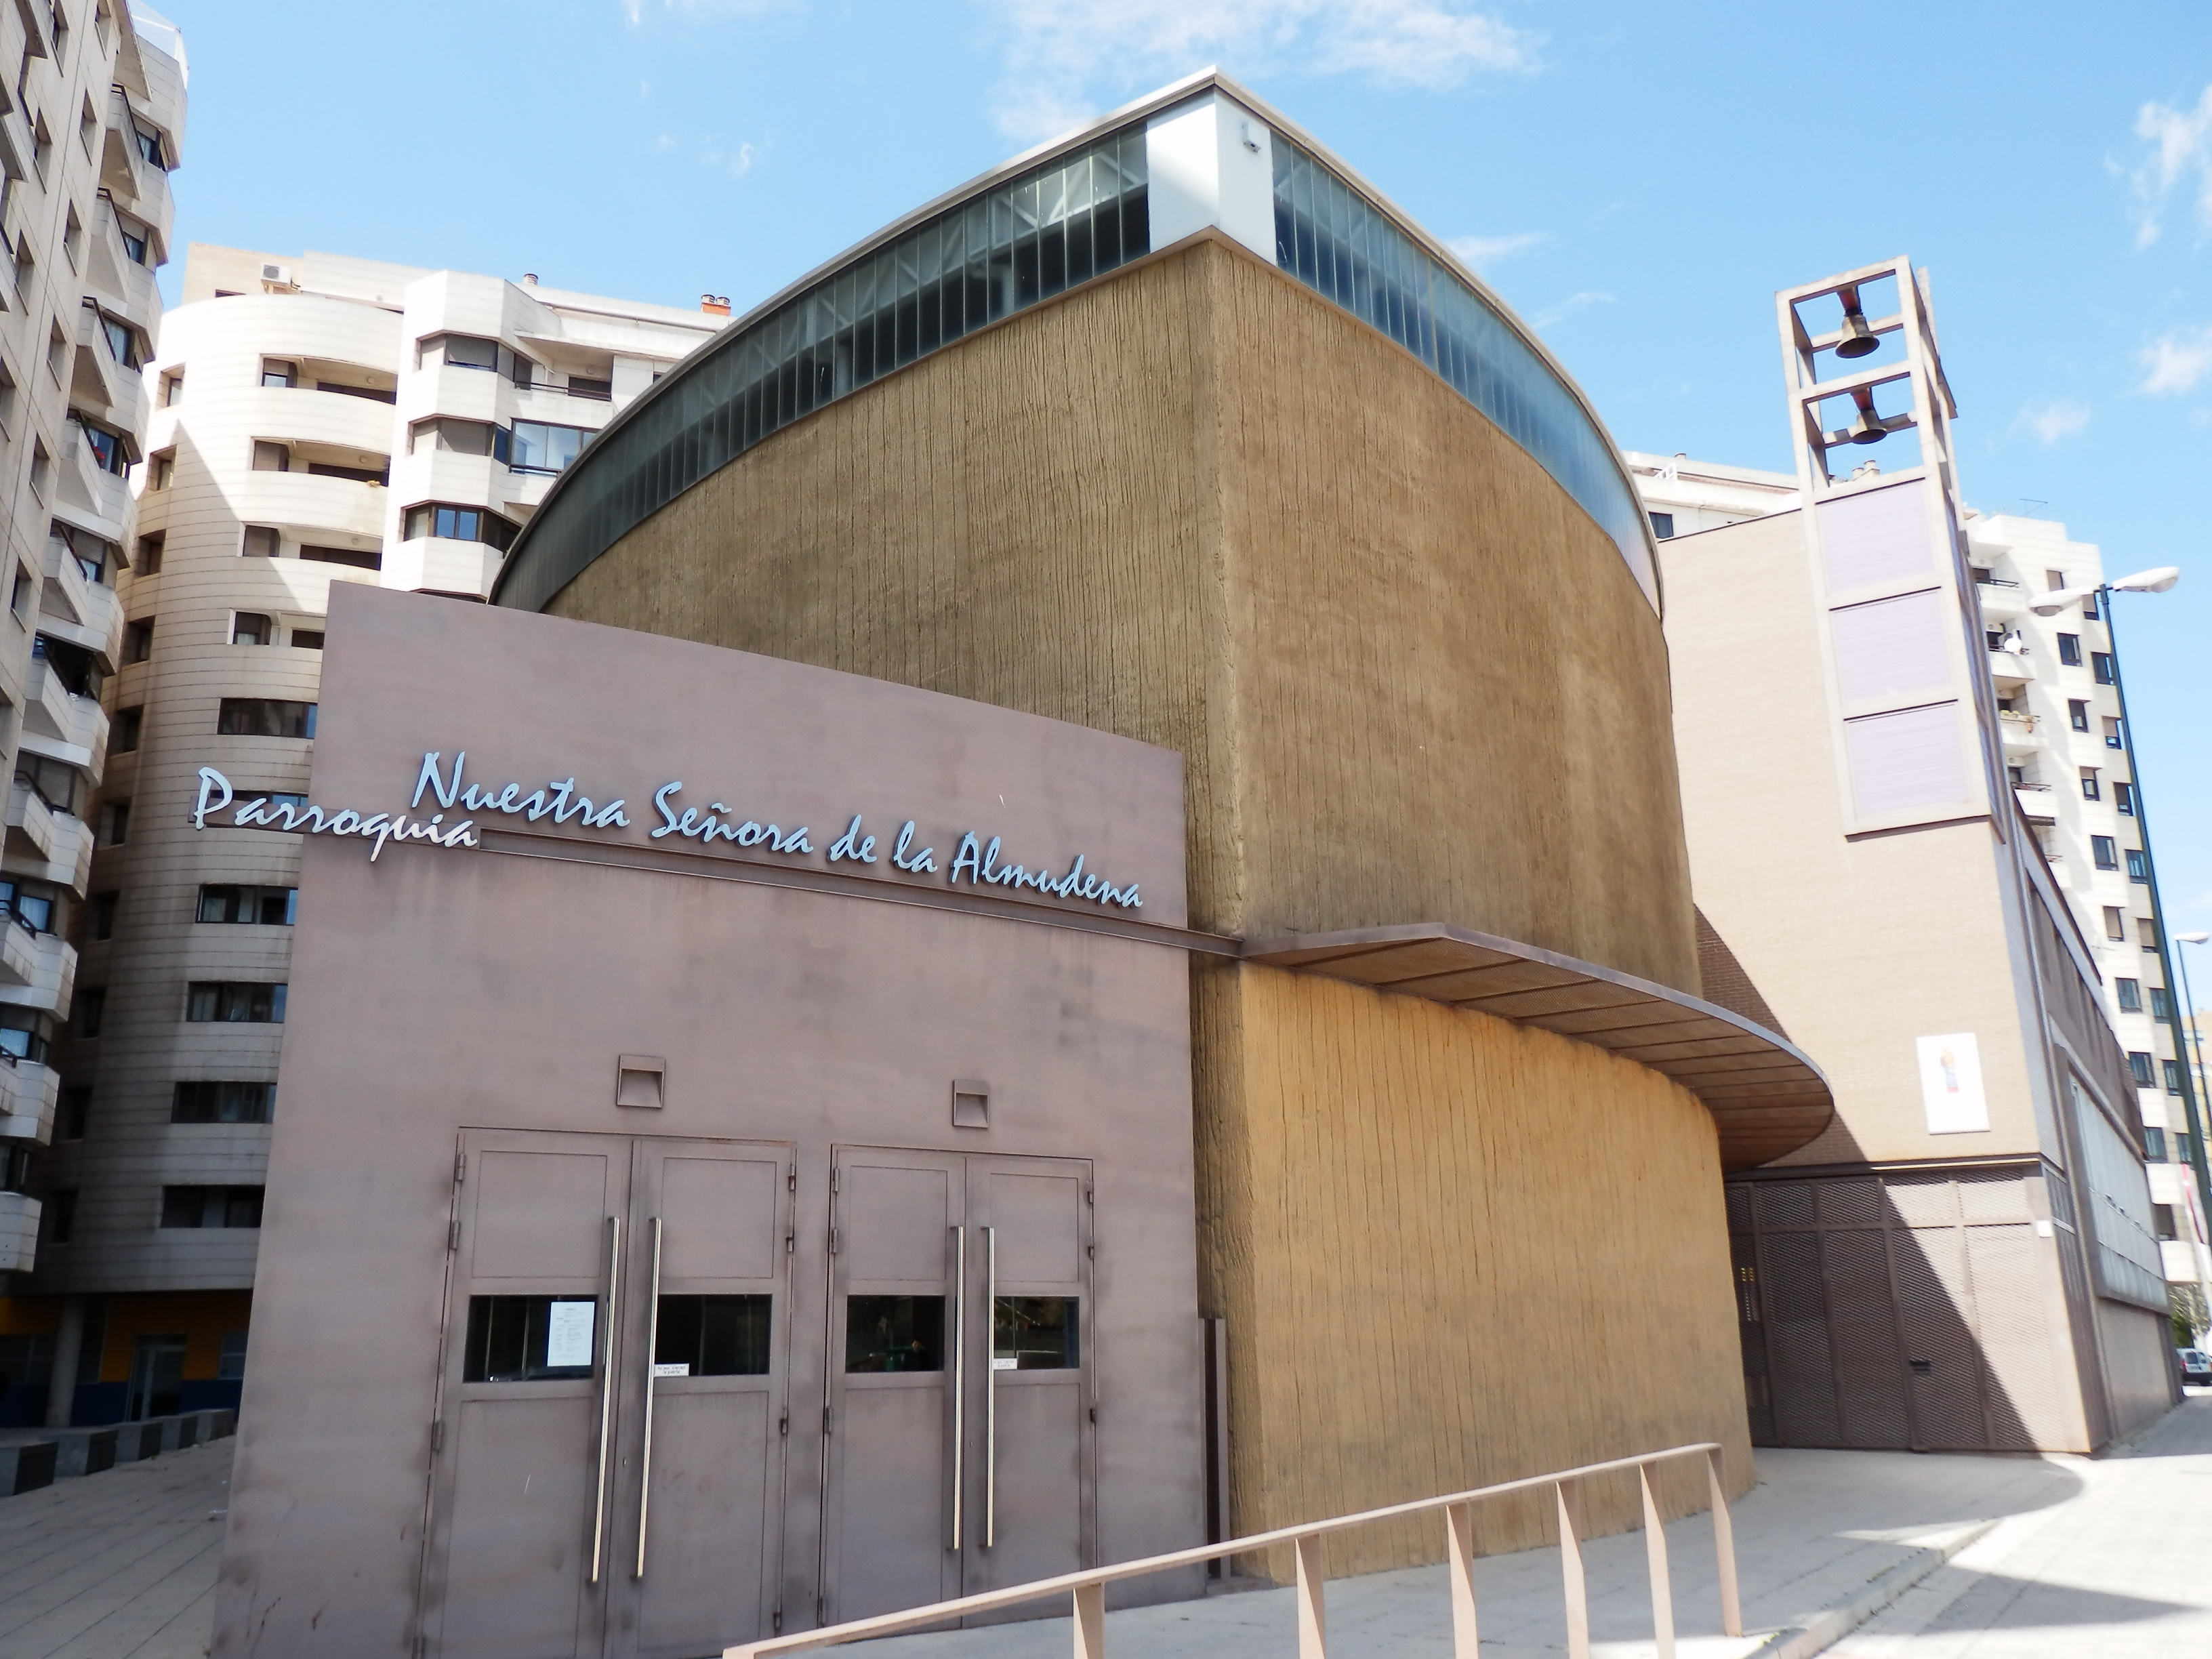 File Parroquia Nuestra Señora Almudena Zaragoza 2 Jpg Wikimedia Commons